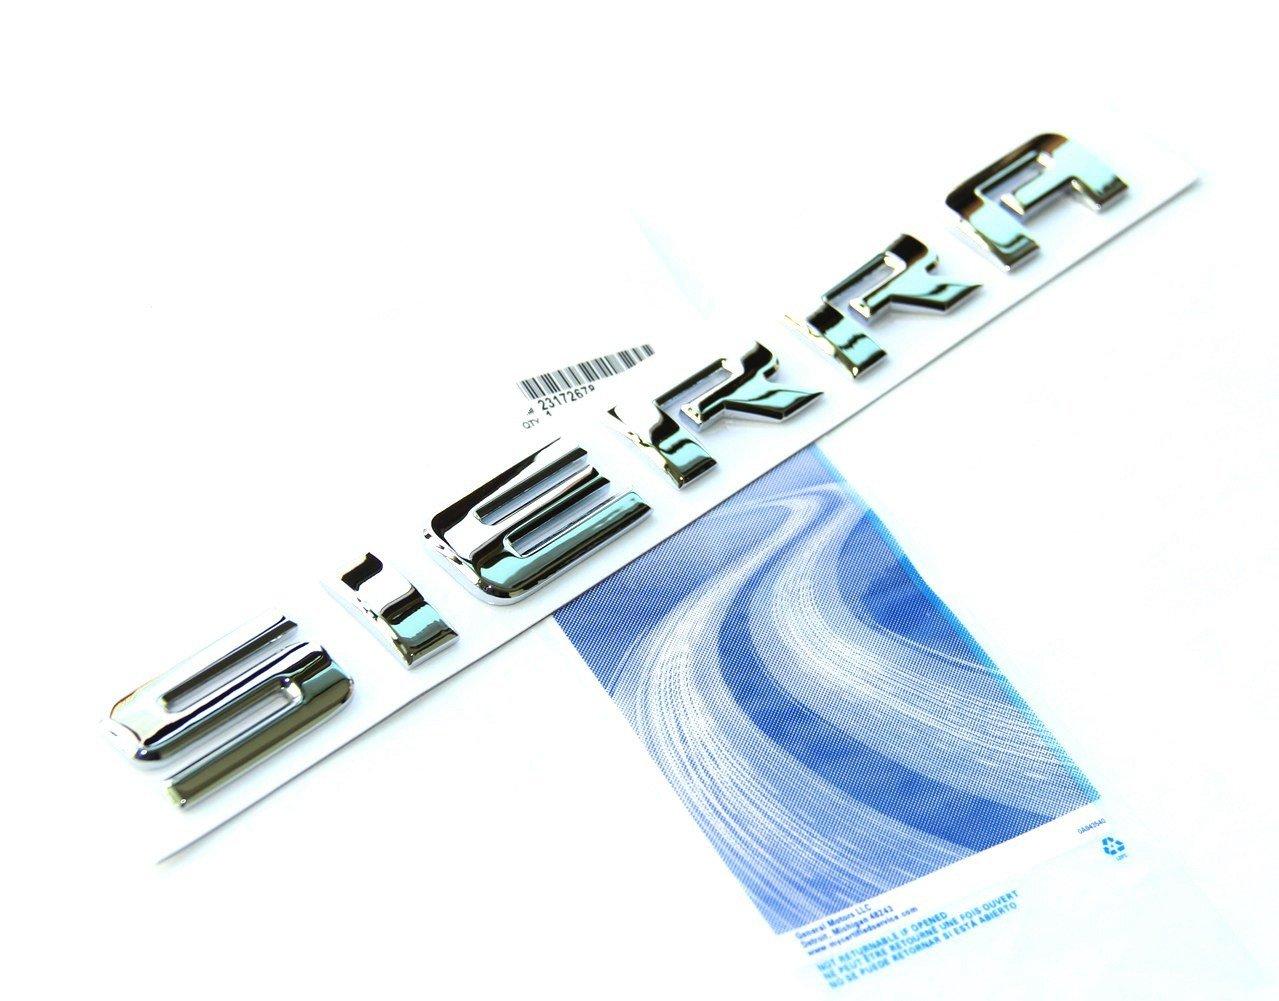 Yoaoo 3pcs OEM Chrome SIERRA Nameplates Letter Emblems Badges Glossy Alloy for Chevrolet Gm 2500HD 3500HD Sierra